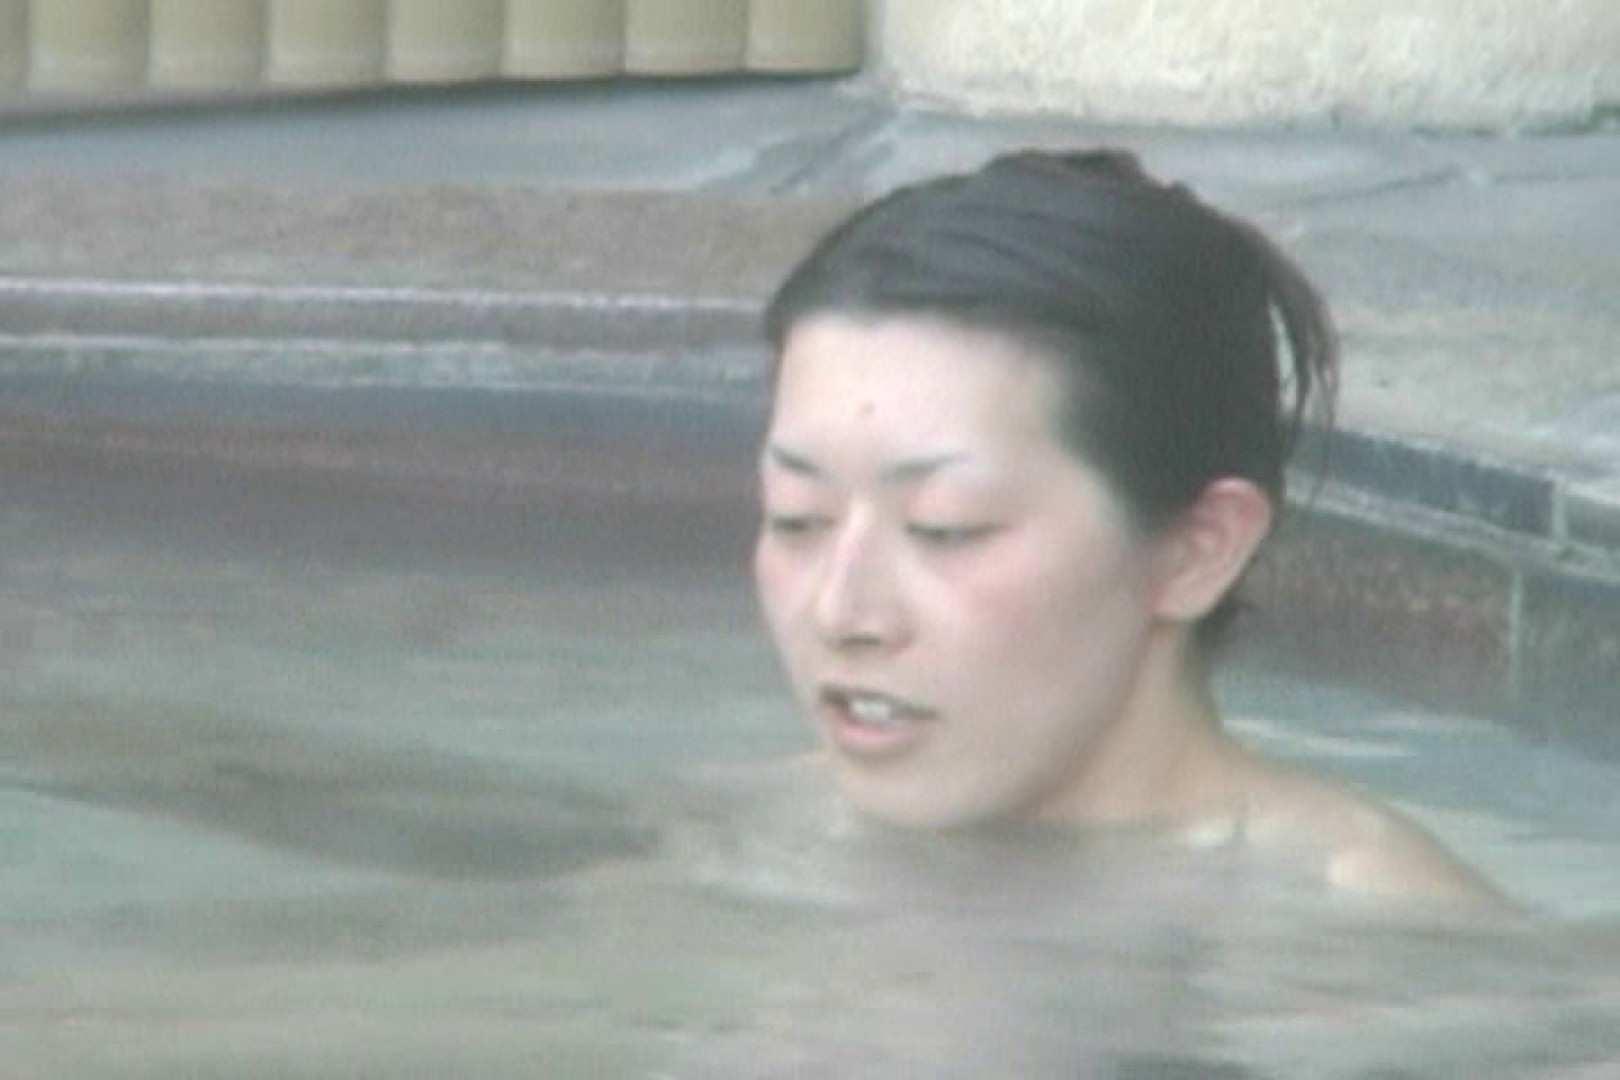 Aquaな露天風呂Vol.589 盗撮 | HなOL  105pic 28